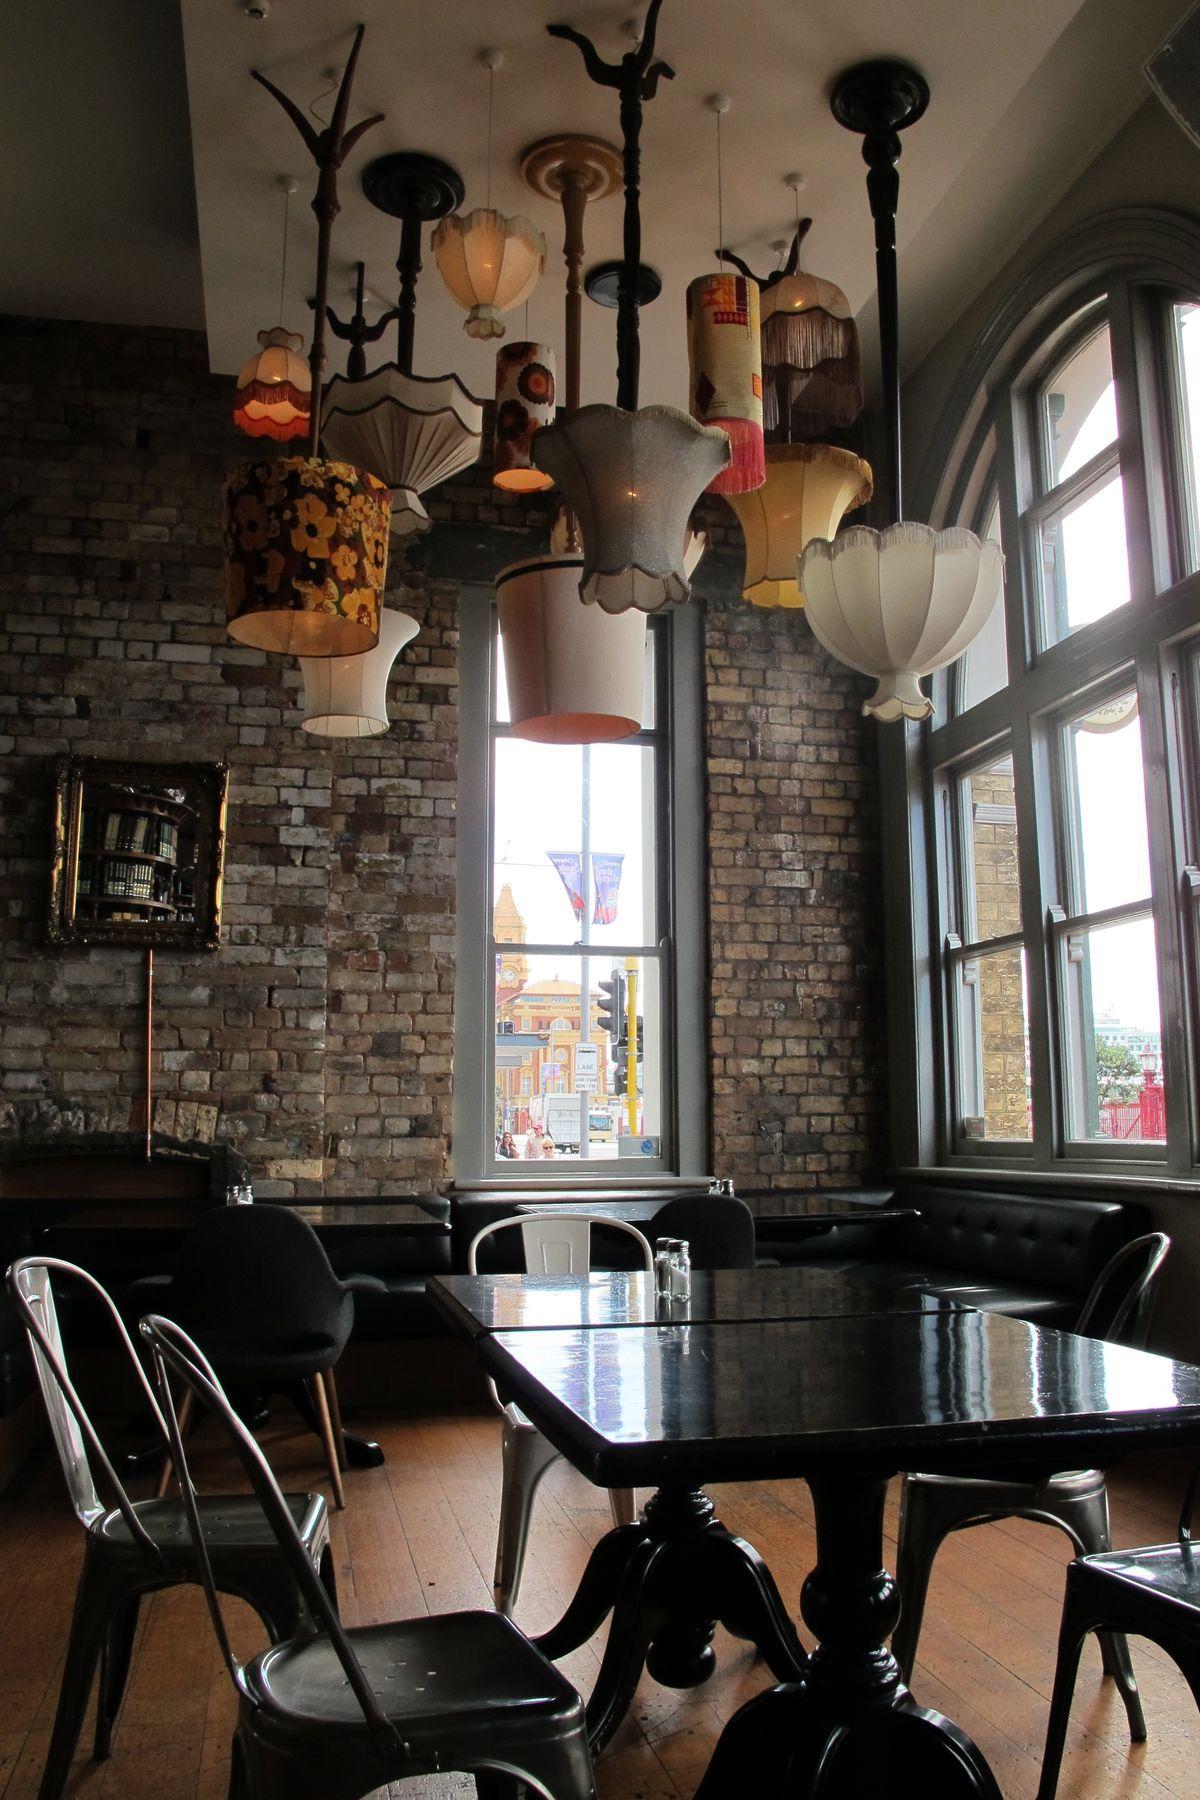 Homepage restaurant lampen und vintage - Old american style houses pragmatism at its best ...